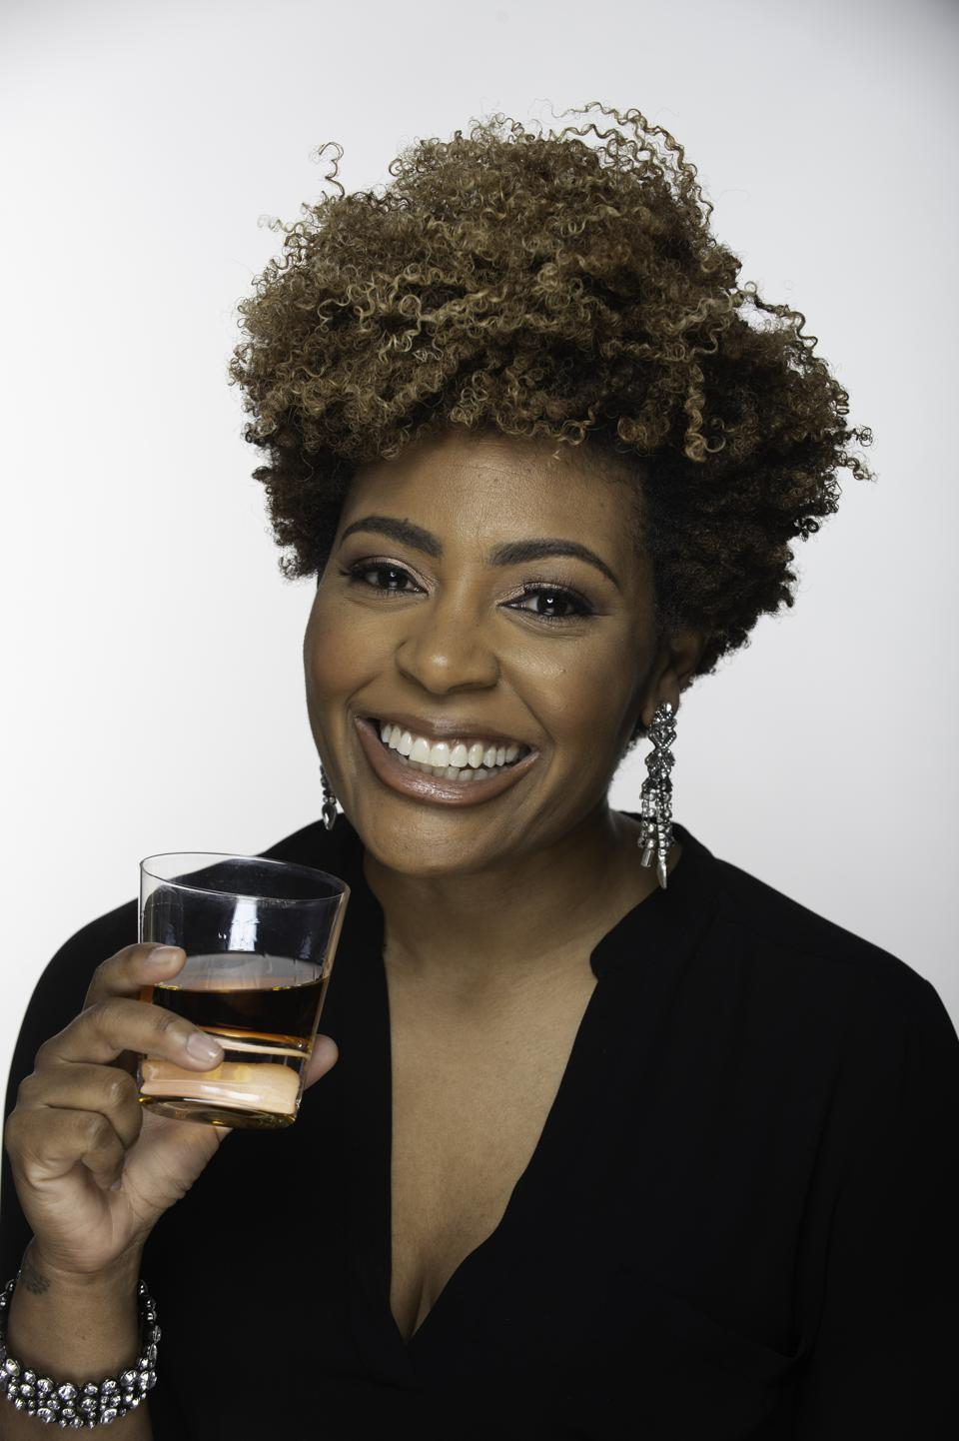 Black Bourbon Society founder Samara Davis with glass of whiskey